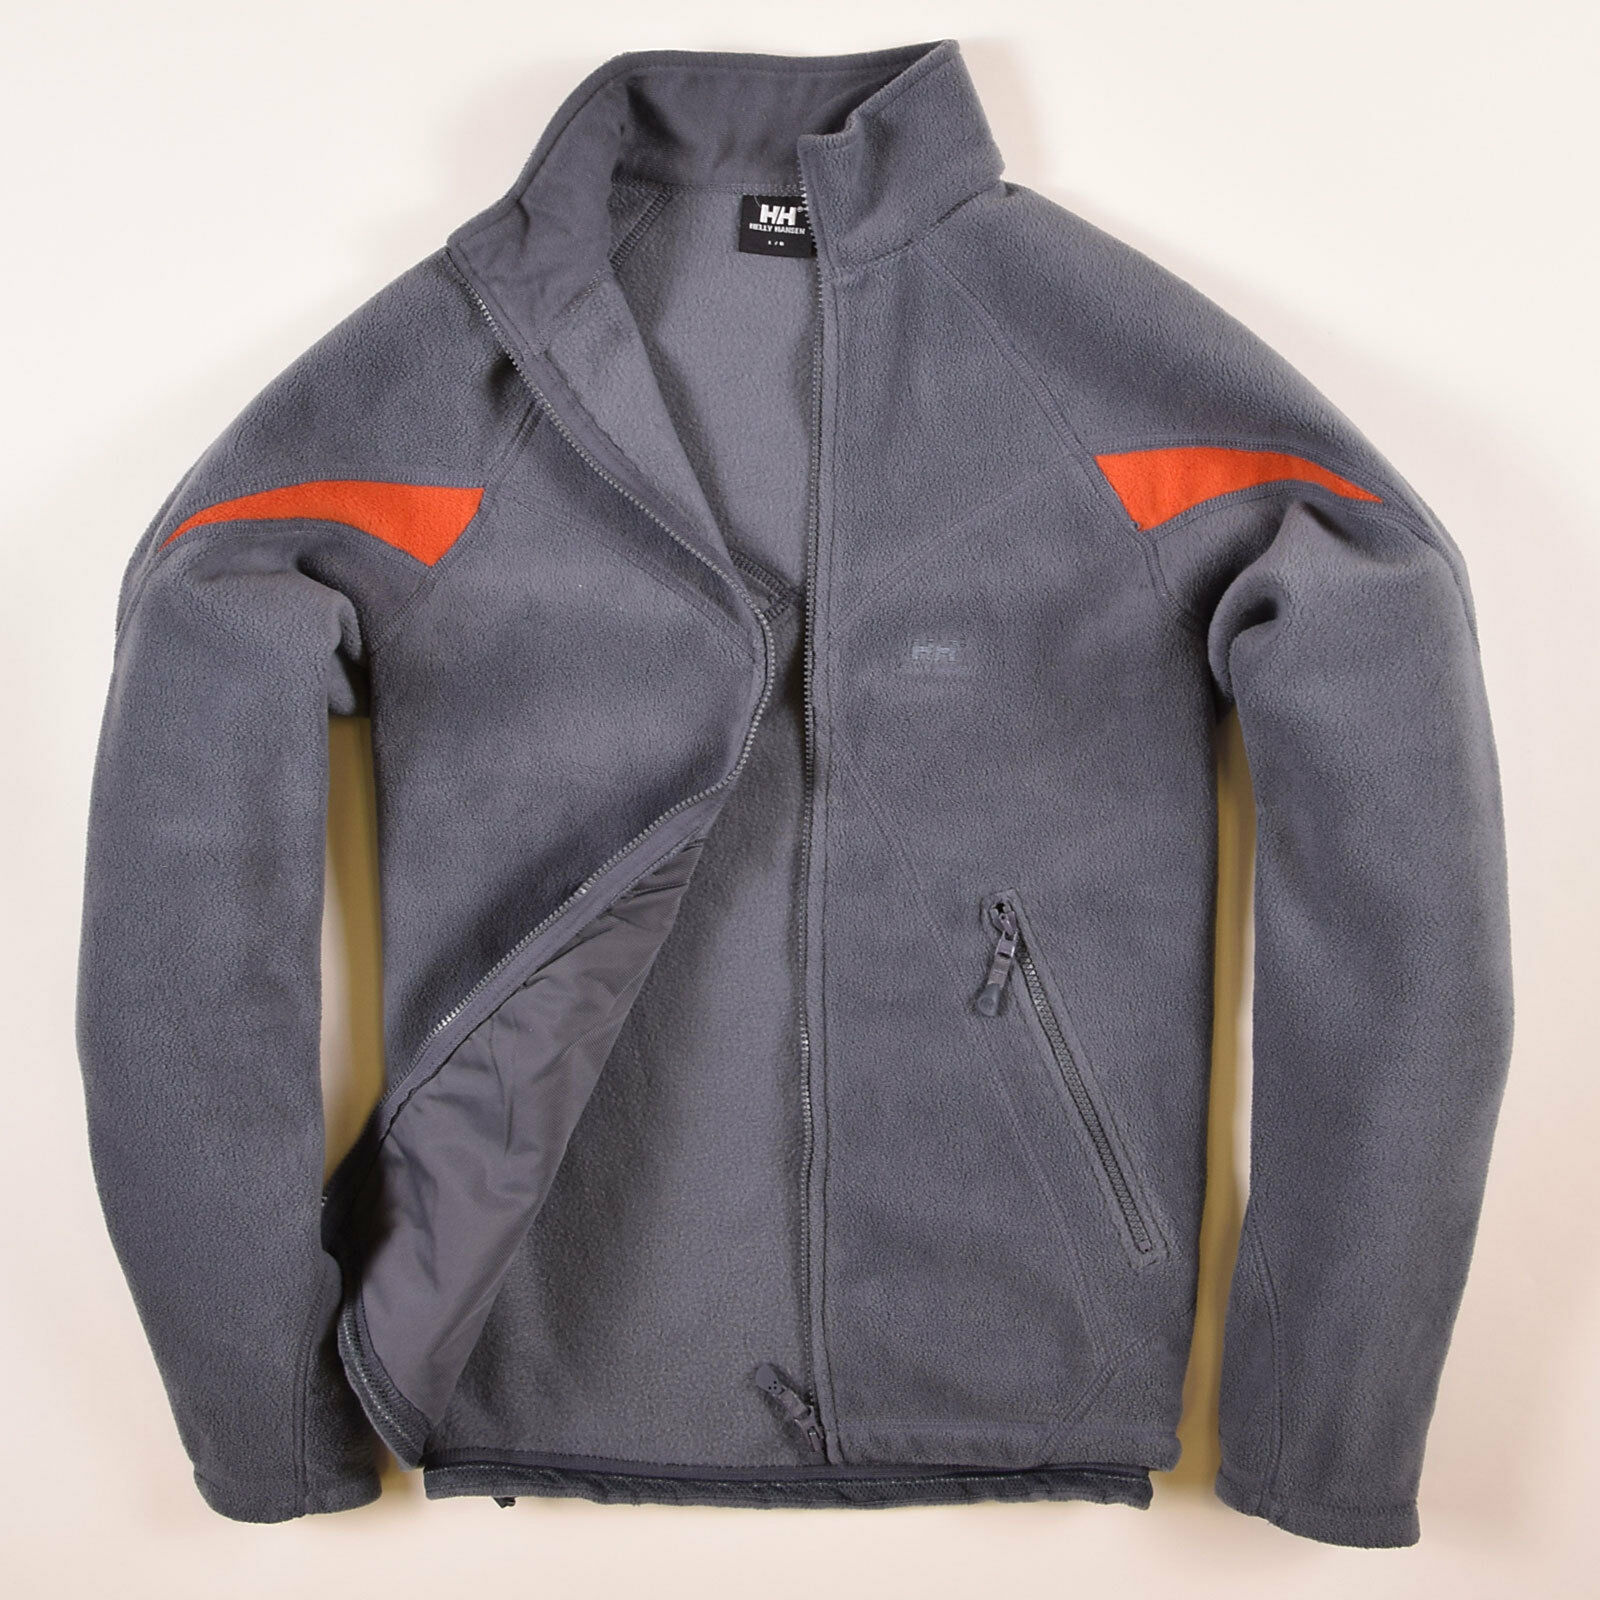 Hansen Jacket Helly L Polaire Veste 58332 Hommes Gris Taille TSwdtqFw